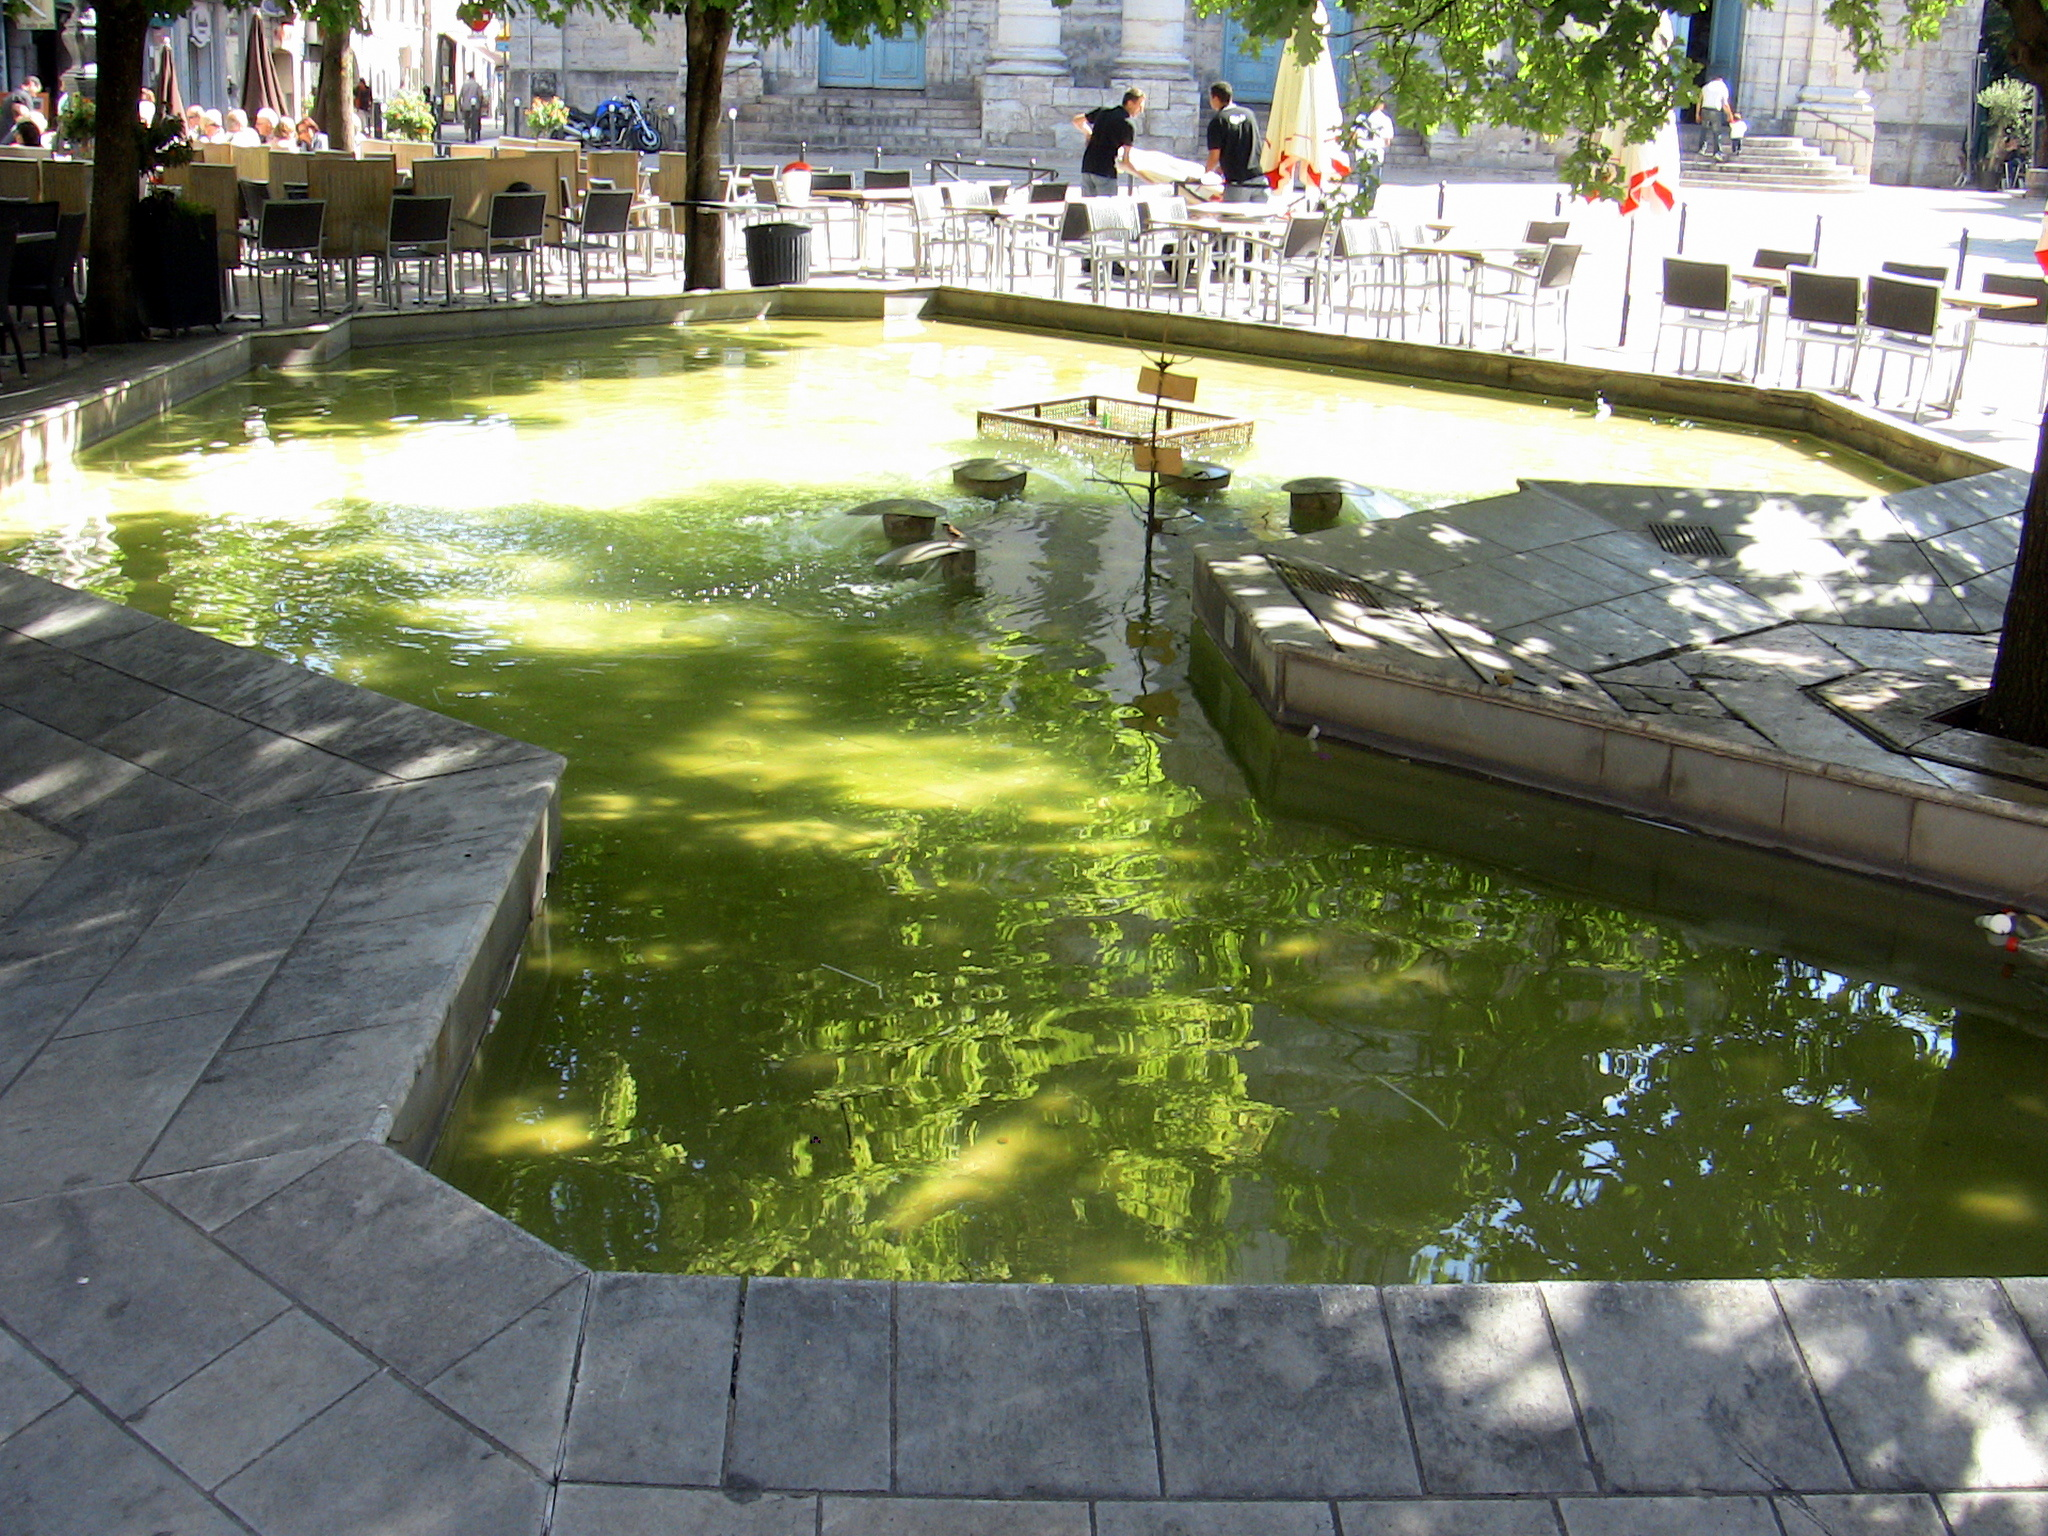 File bassin vauban besan on jpg wikimedia commons - Bassin d ornement preforme besancon ...